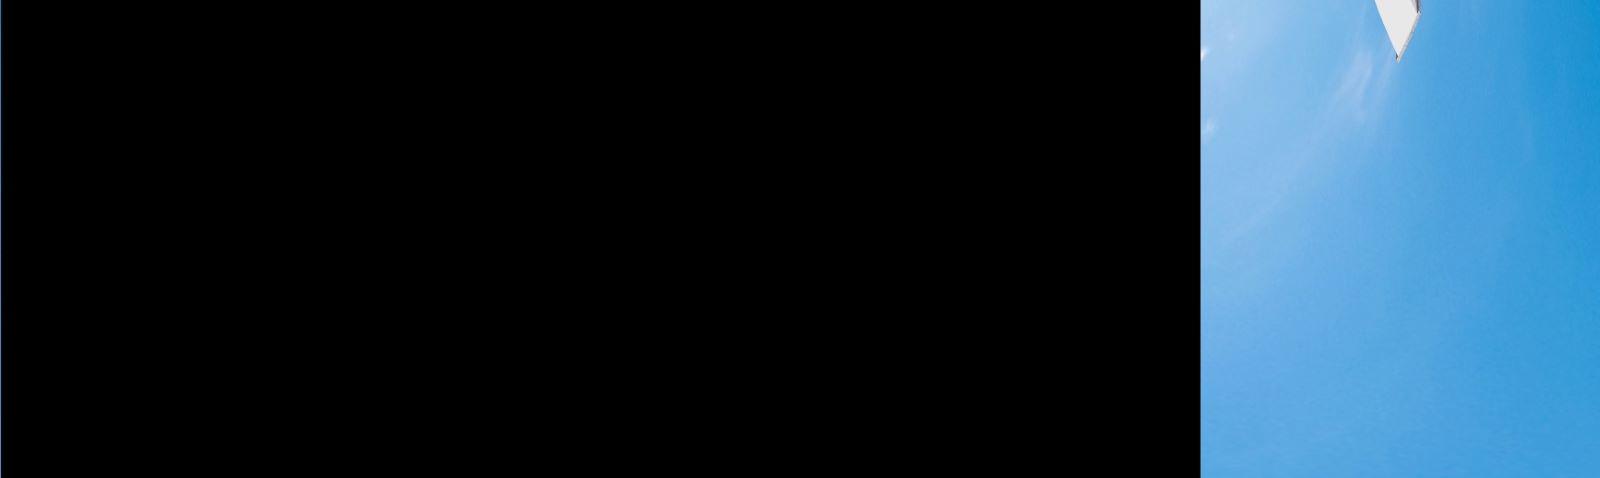 f3%1/1